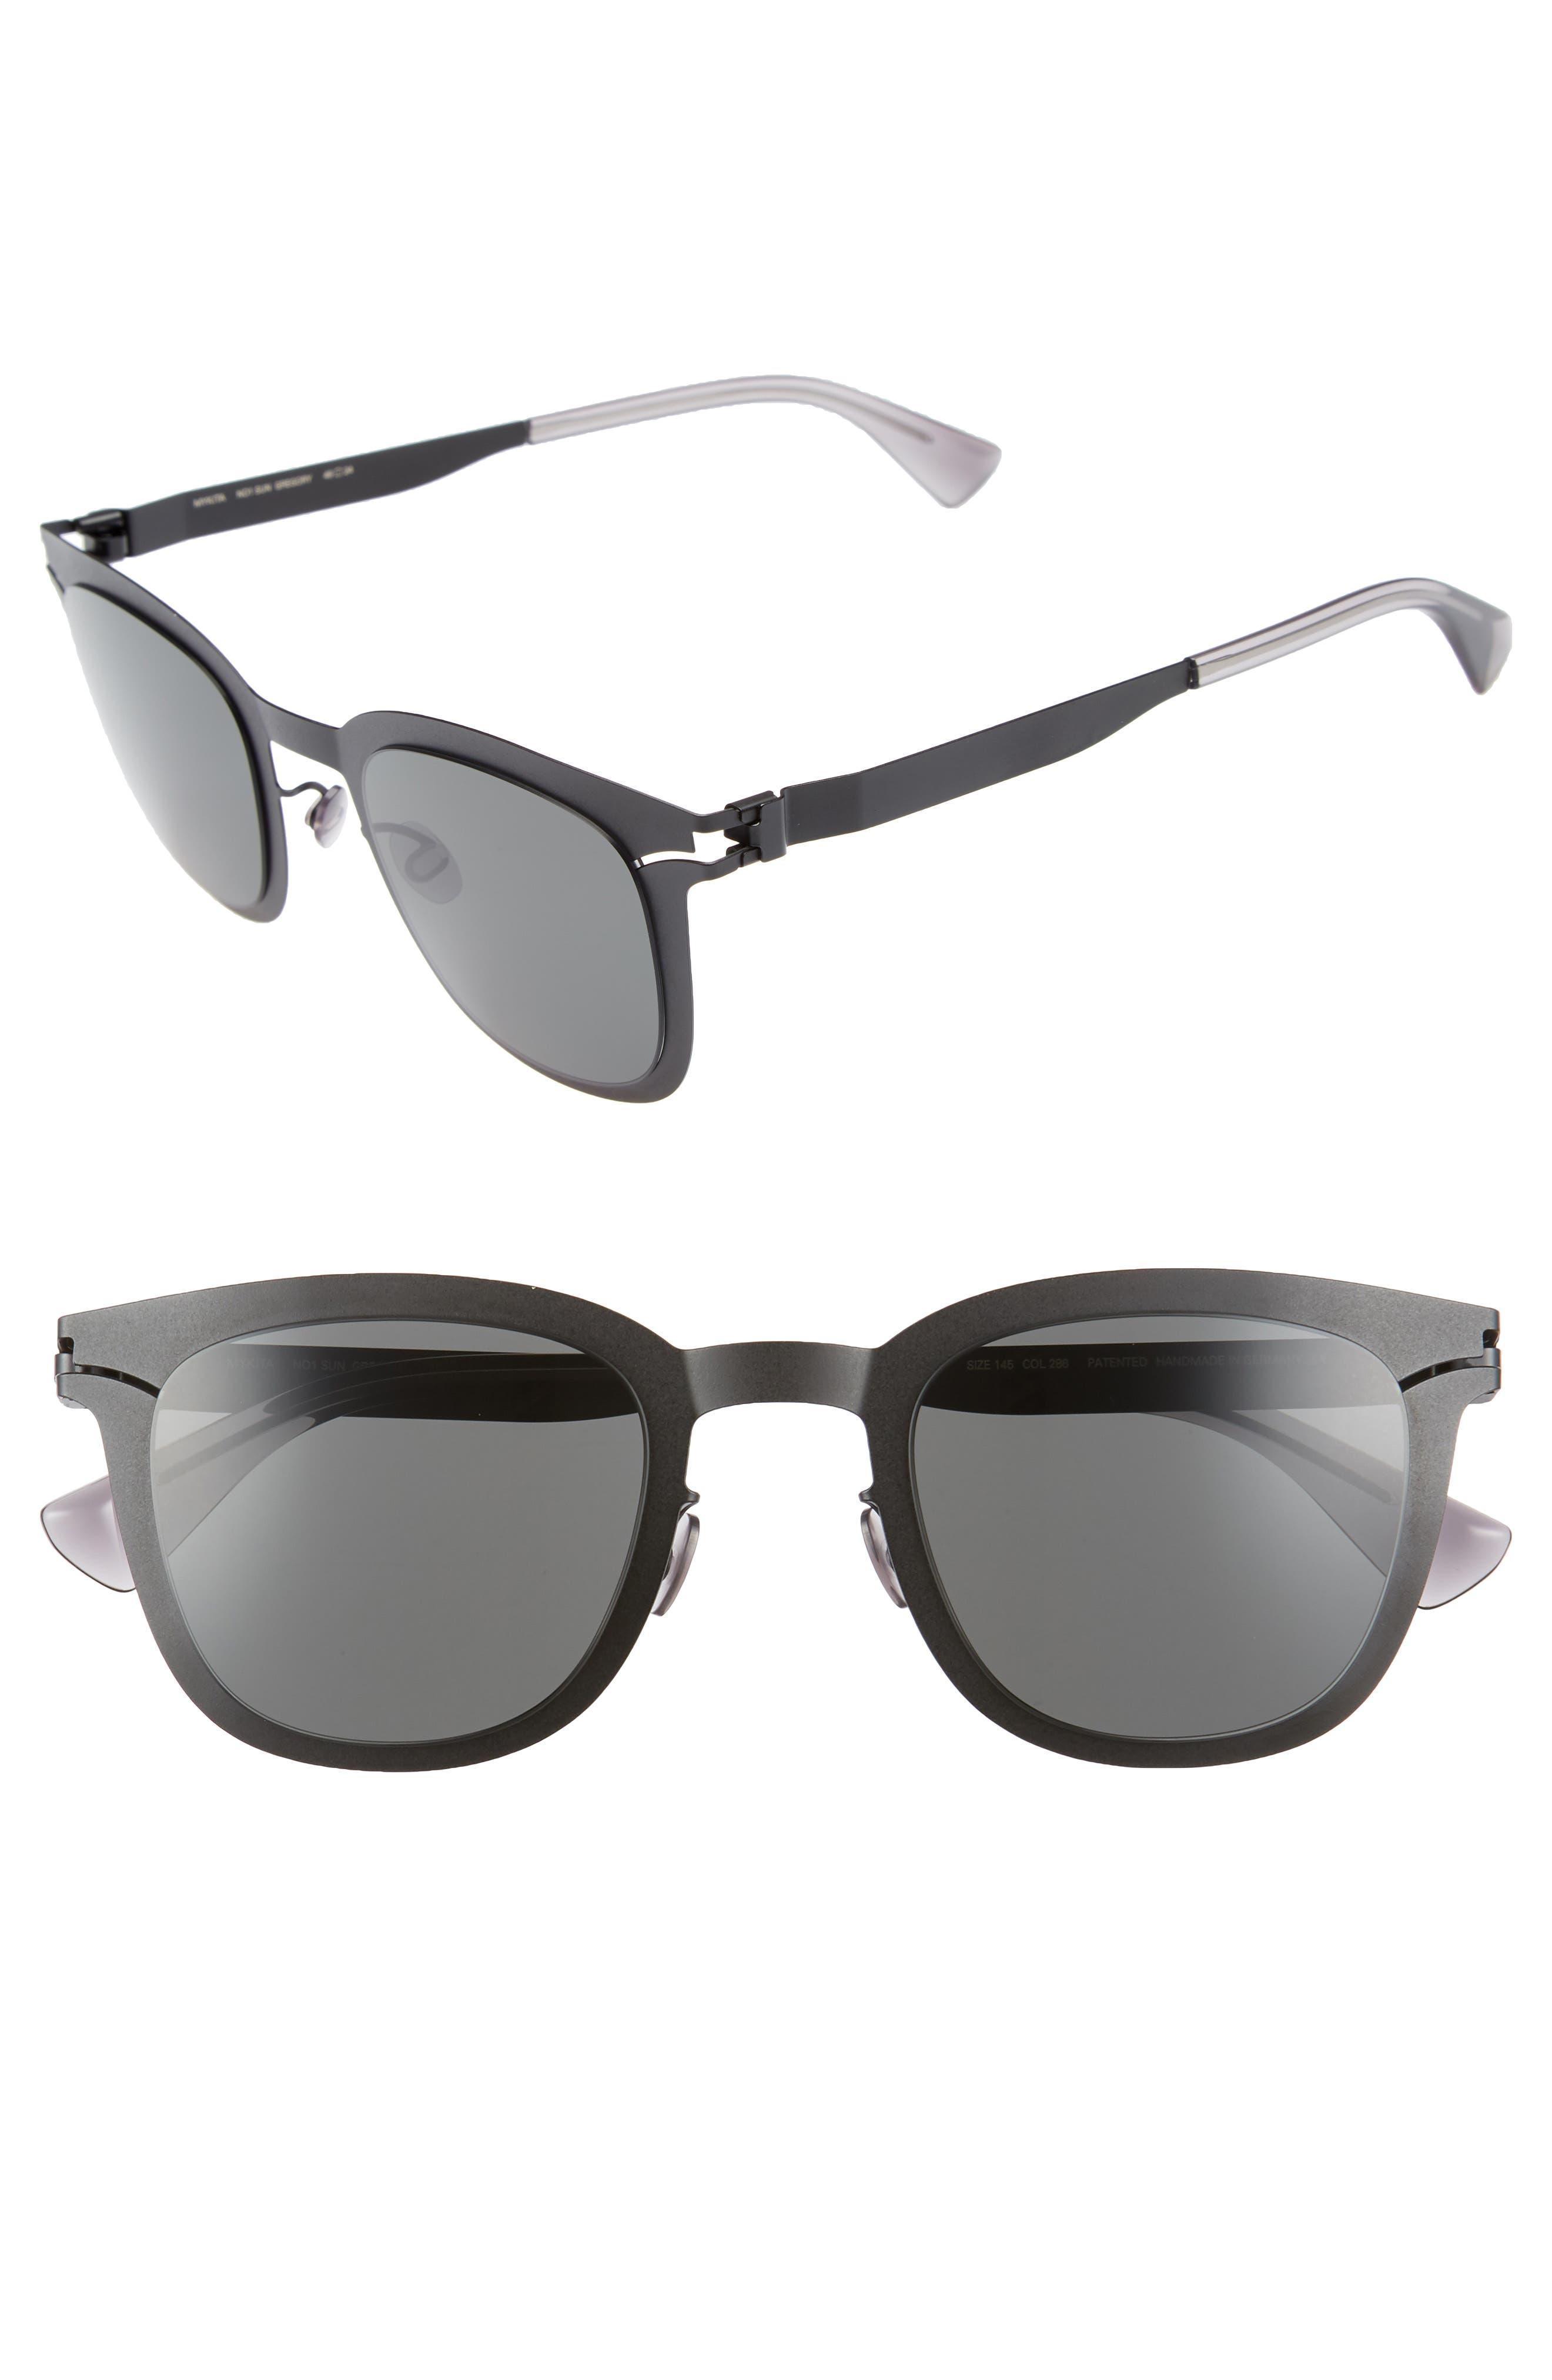 Gregory 49mm Sunglasses,                             Main thumbnail 1, color,                             Matte Black